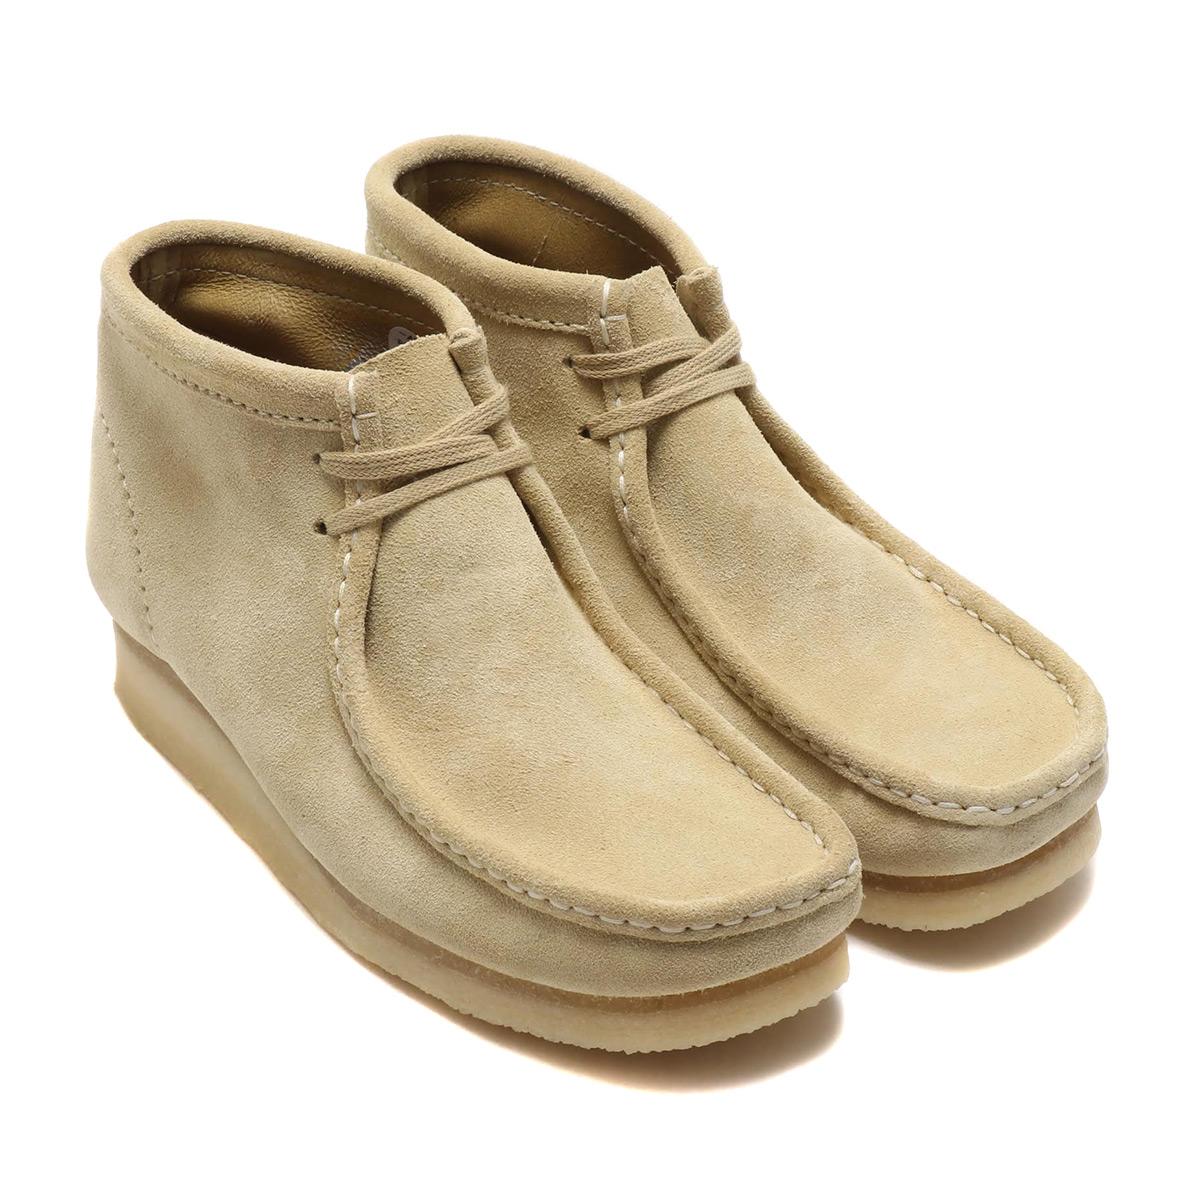 Clarks Wallabee Boot (クラークス ワラビー ブーツ)Maple Suede【メンズ ブーツ】18FW-I